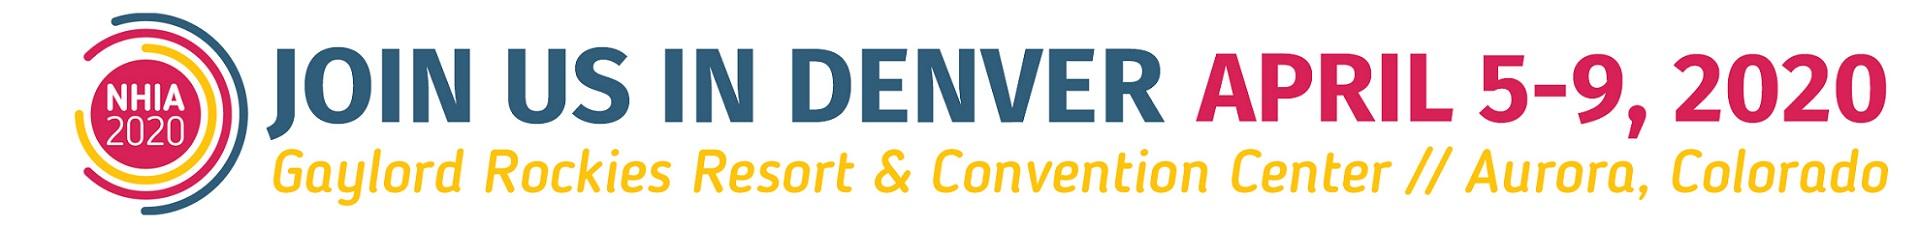 NHIA 2020 Annual Meeting Event Banner